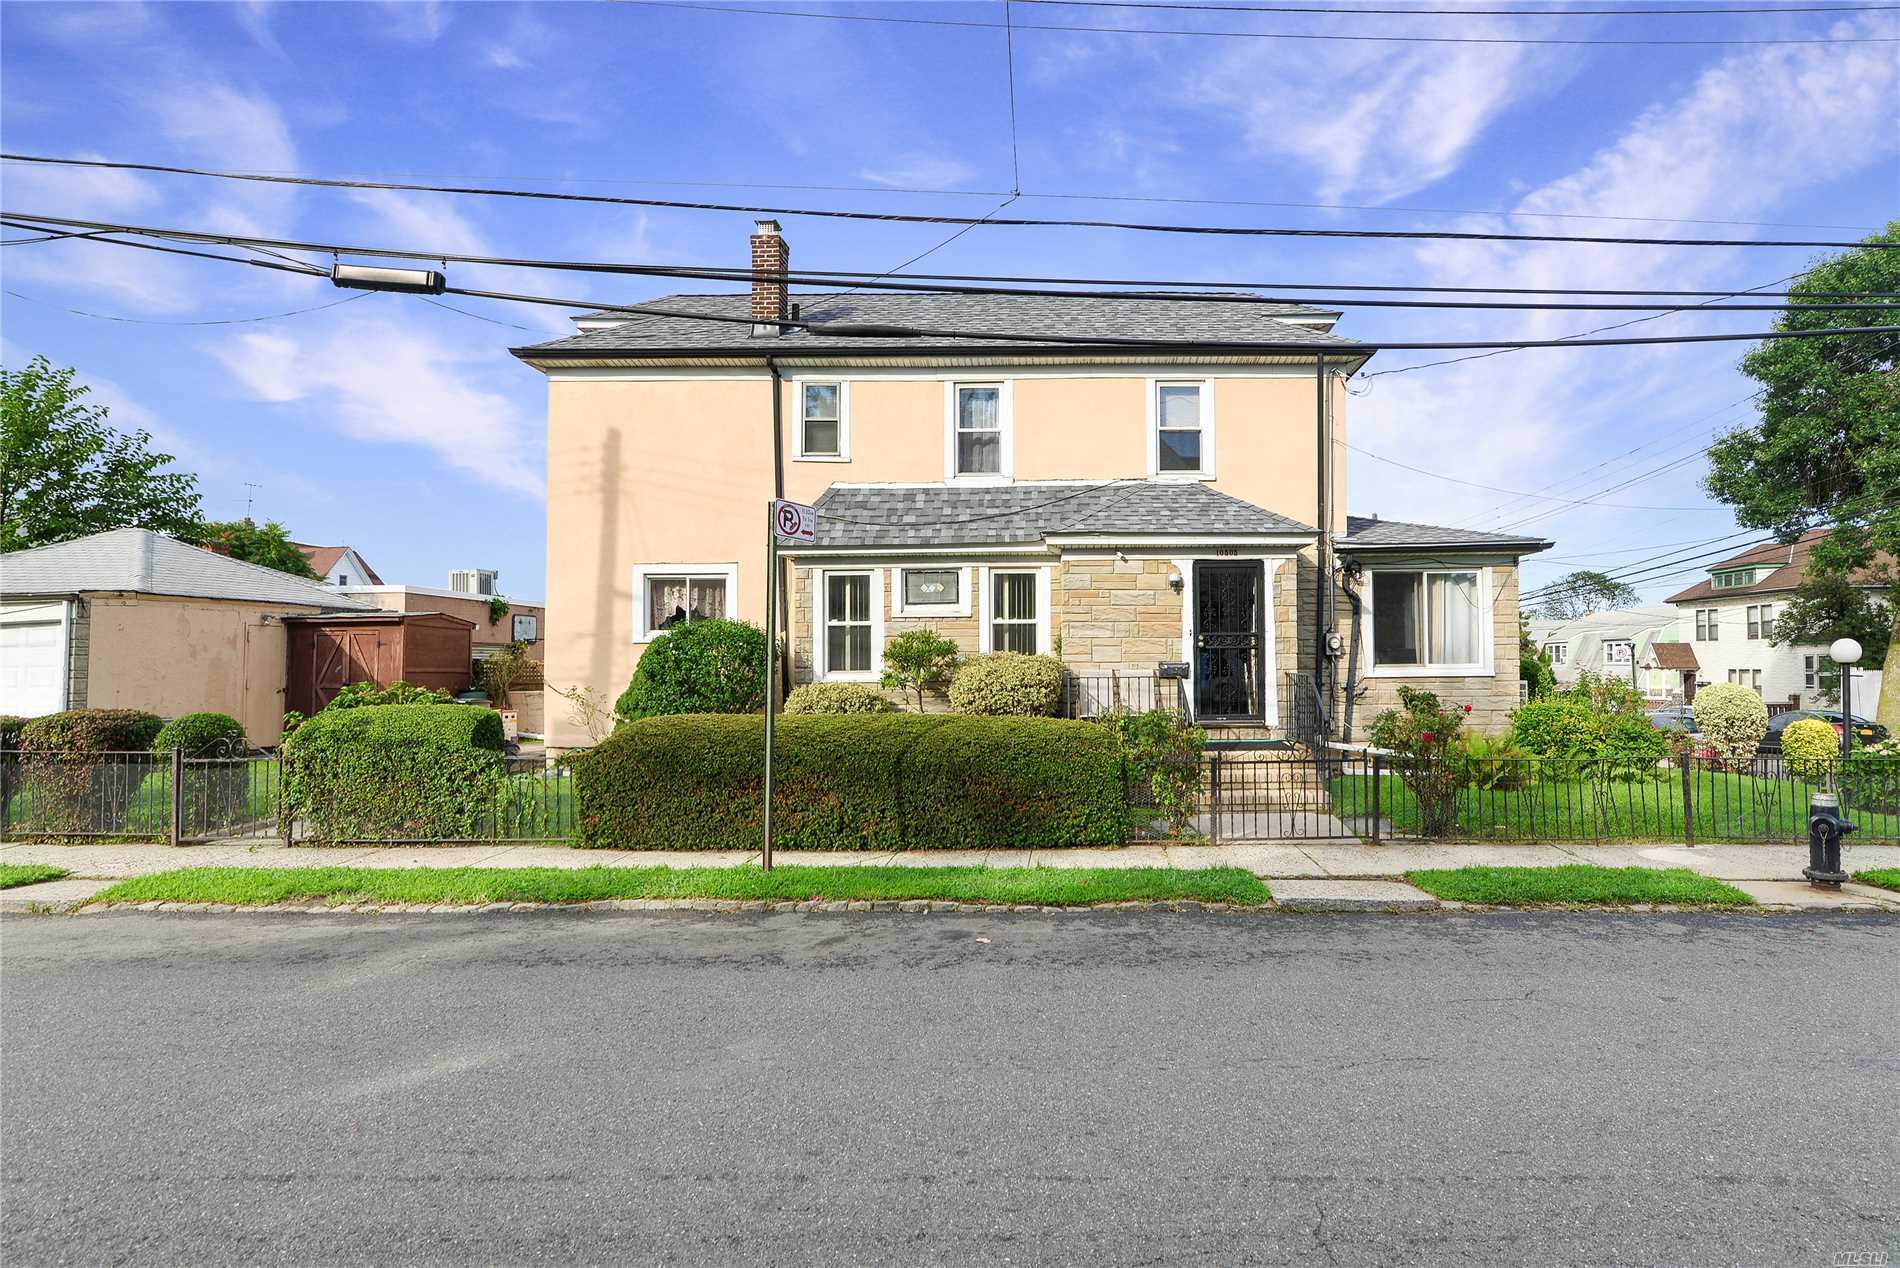 Property for sale at 105-05 27 Ave, East Elmhurst,  New York 11369